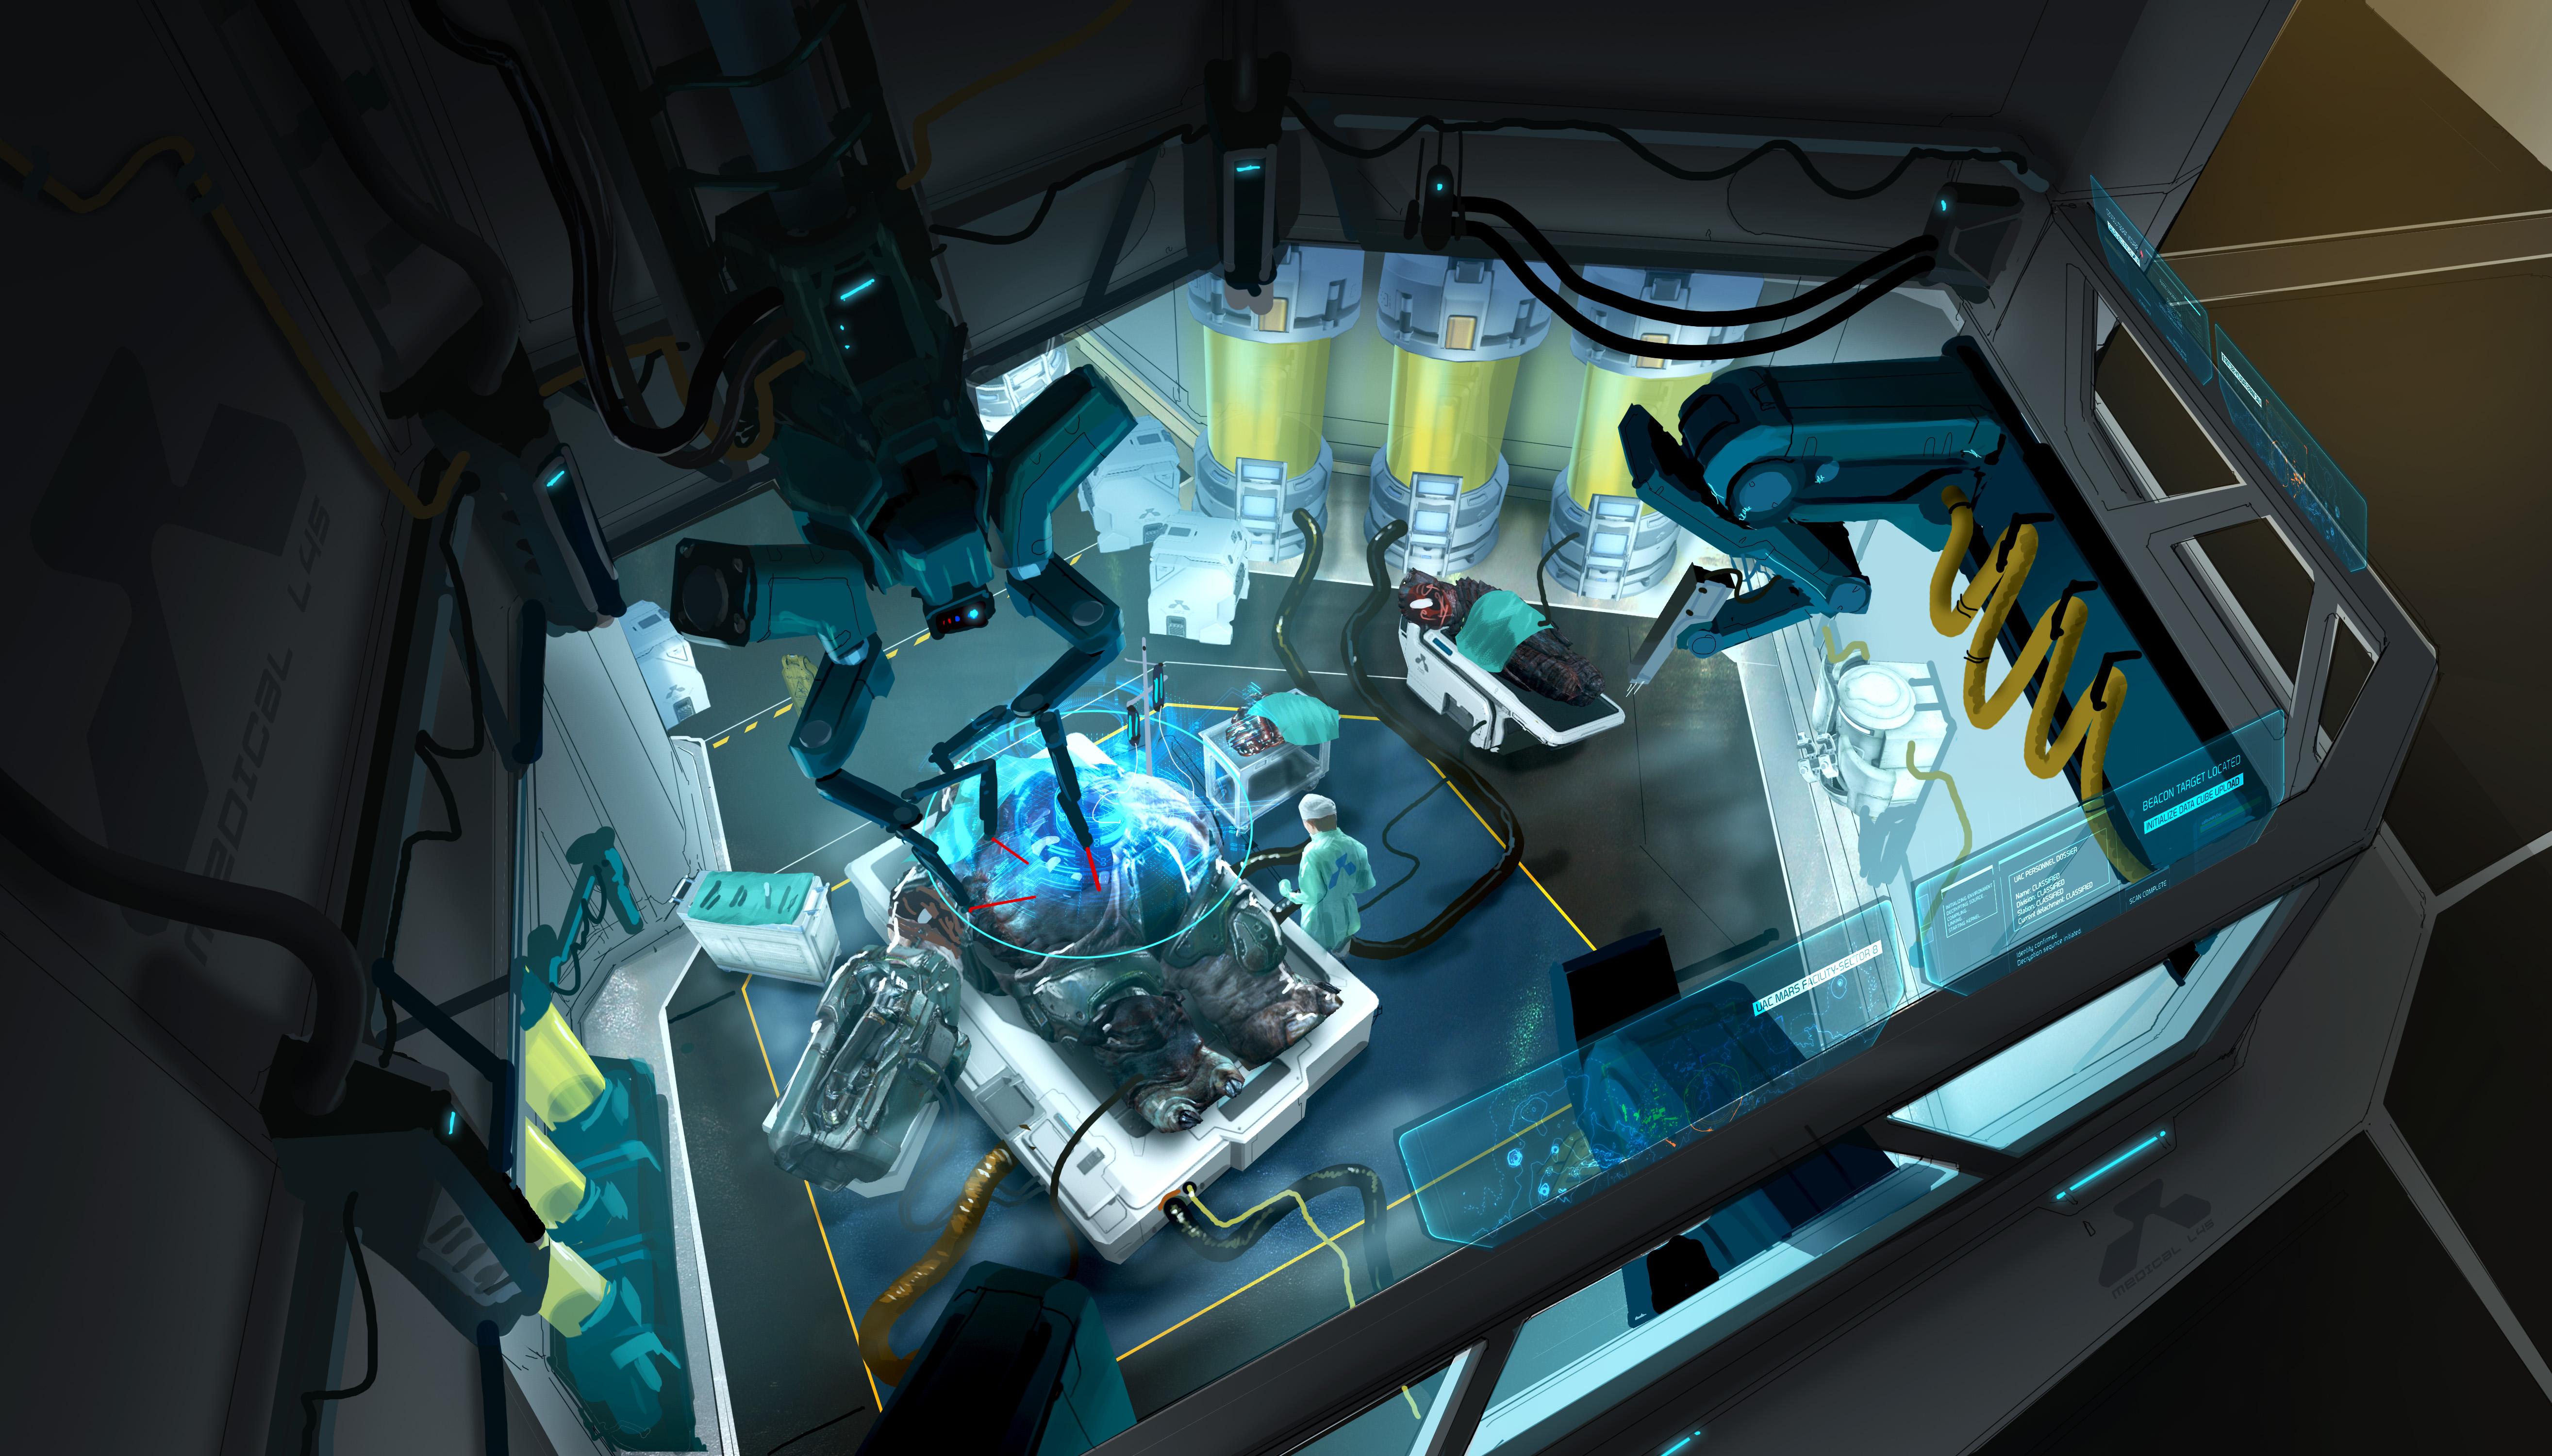 Doom concept art - The Verge